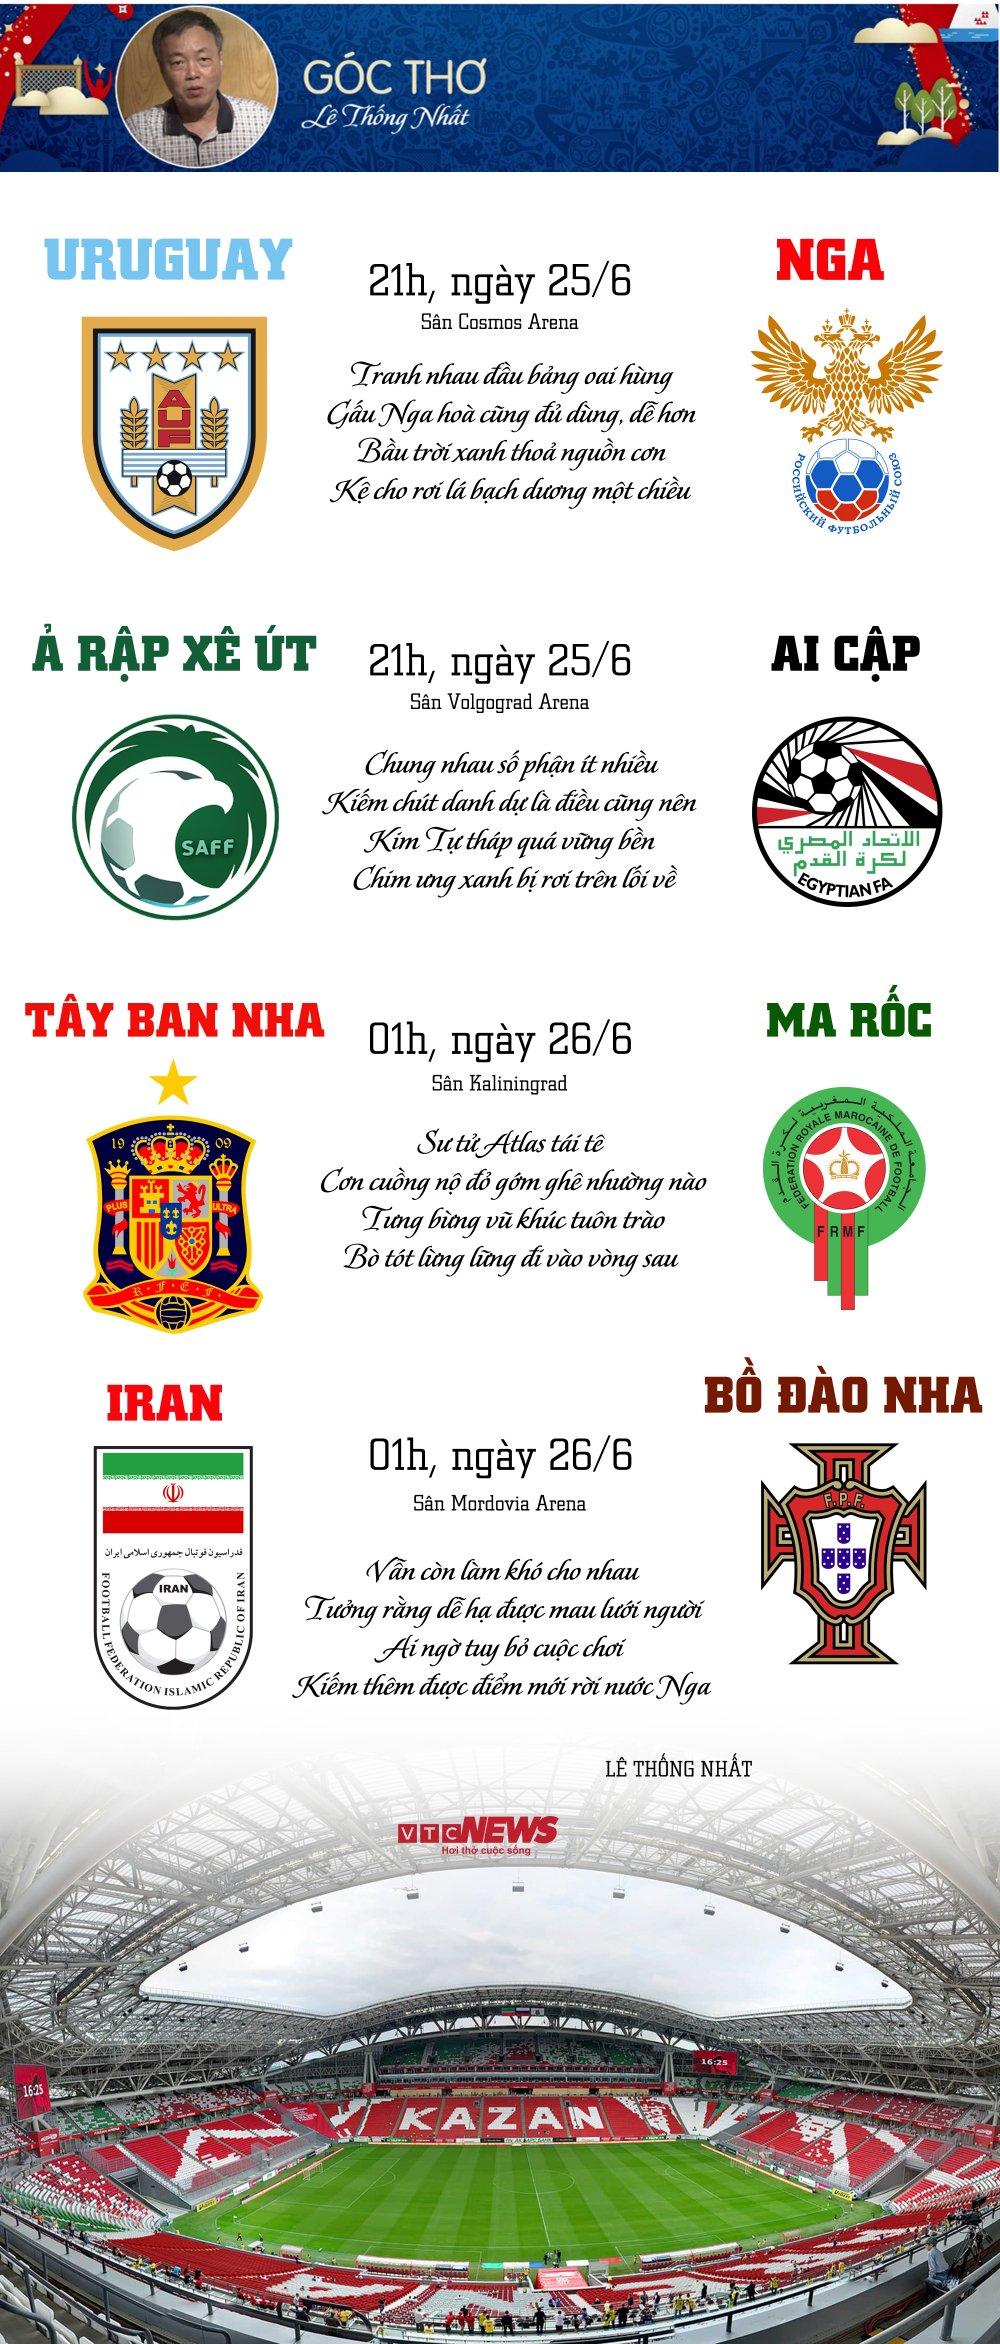 Tien si Le Thong Nhat du doan Ronaldo va dong doi bi Iran lam kho hinh anh 1